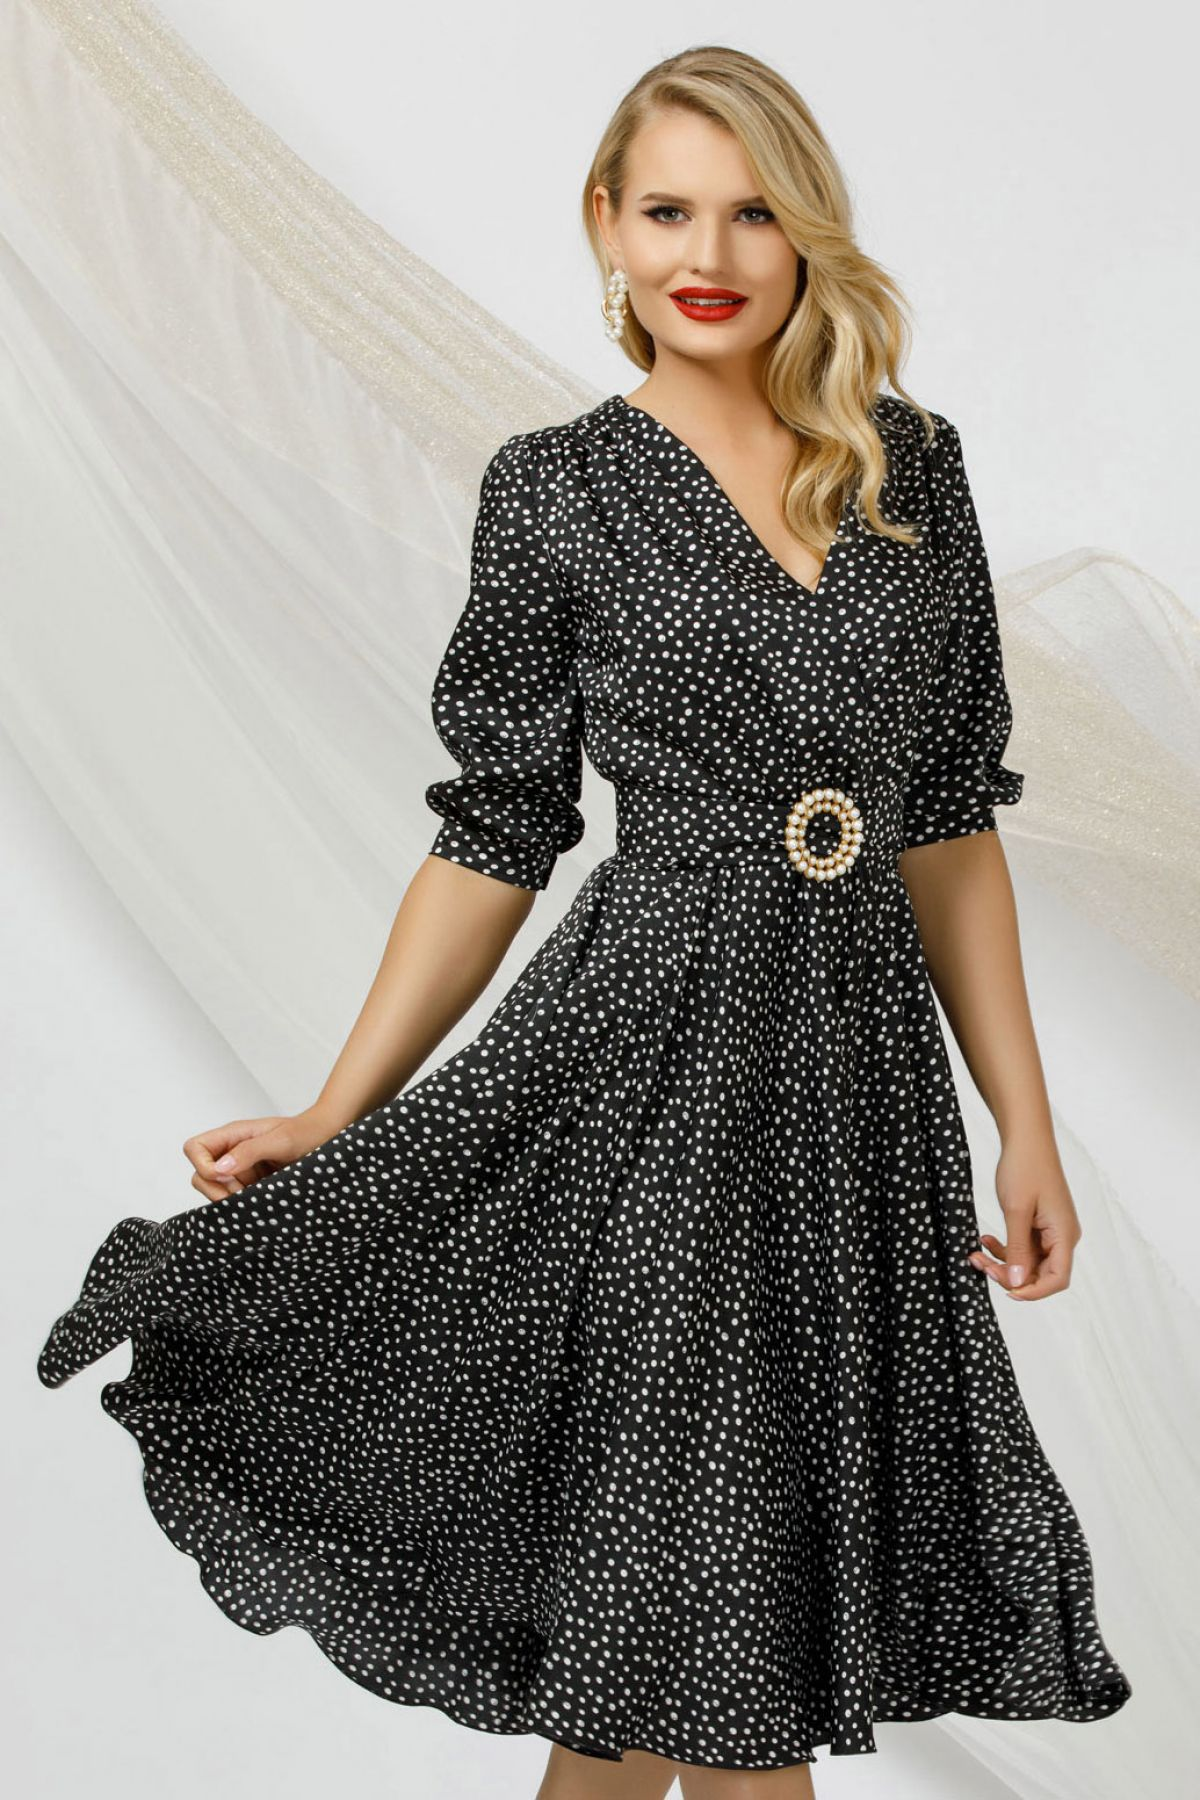 Rochie eleganta Pretty Girl neagra cu buline marunte si catarama